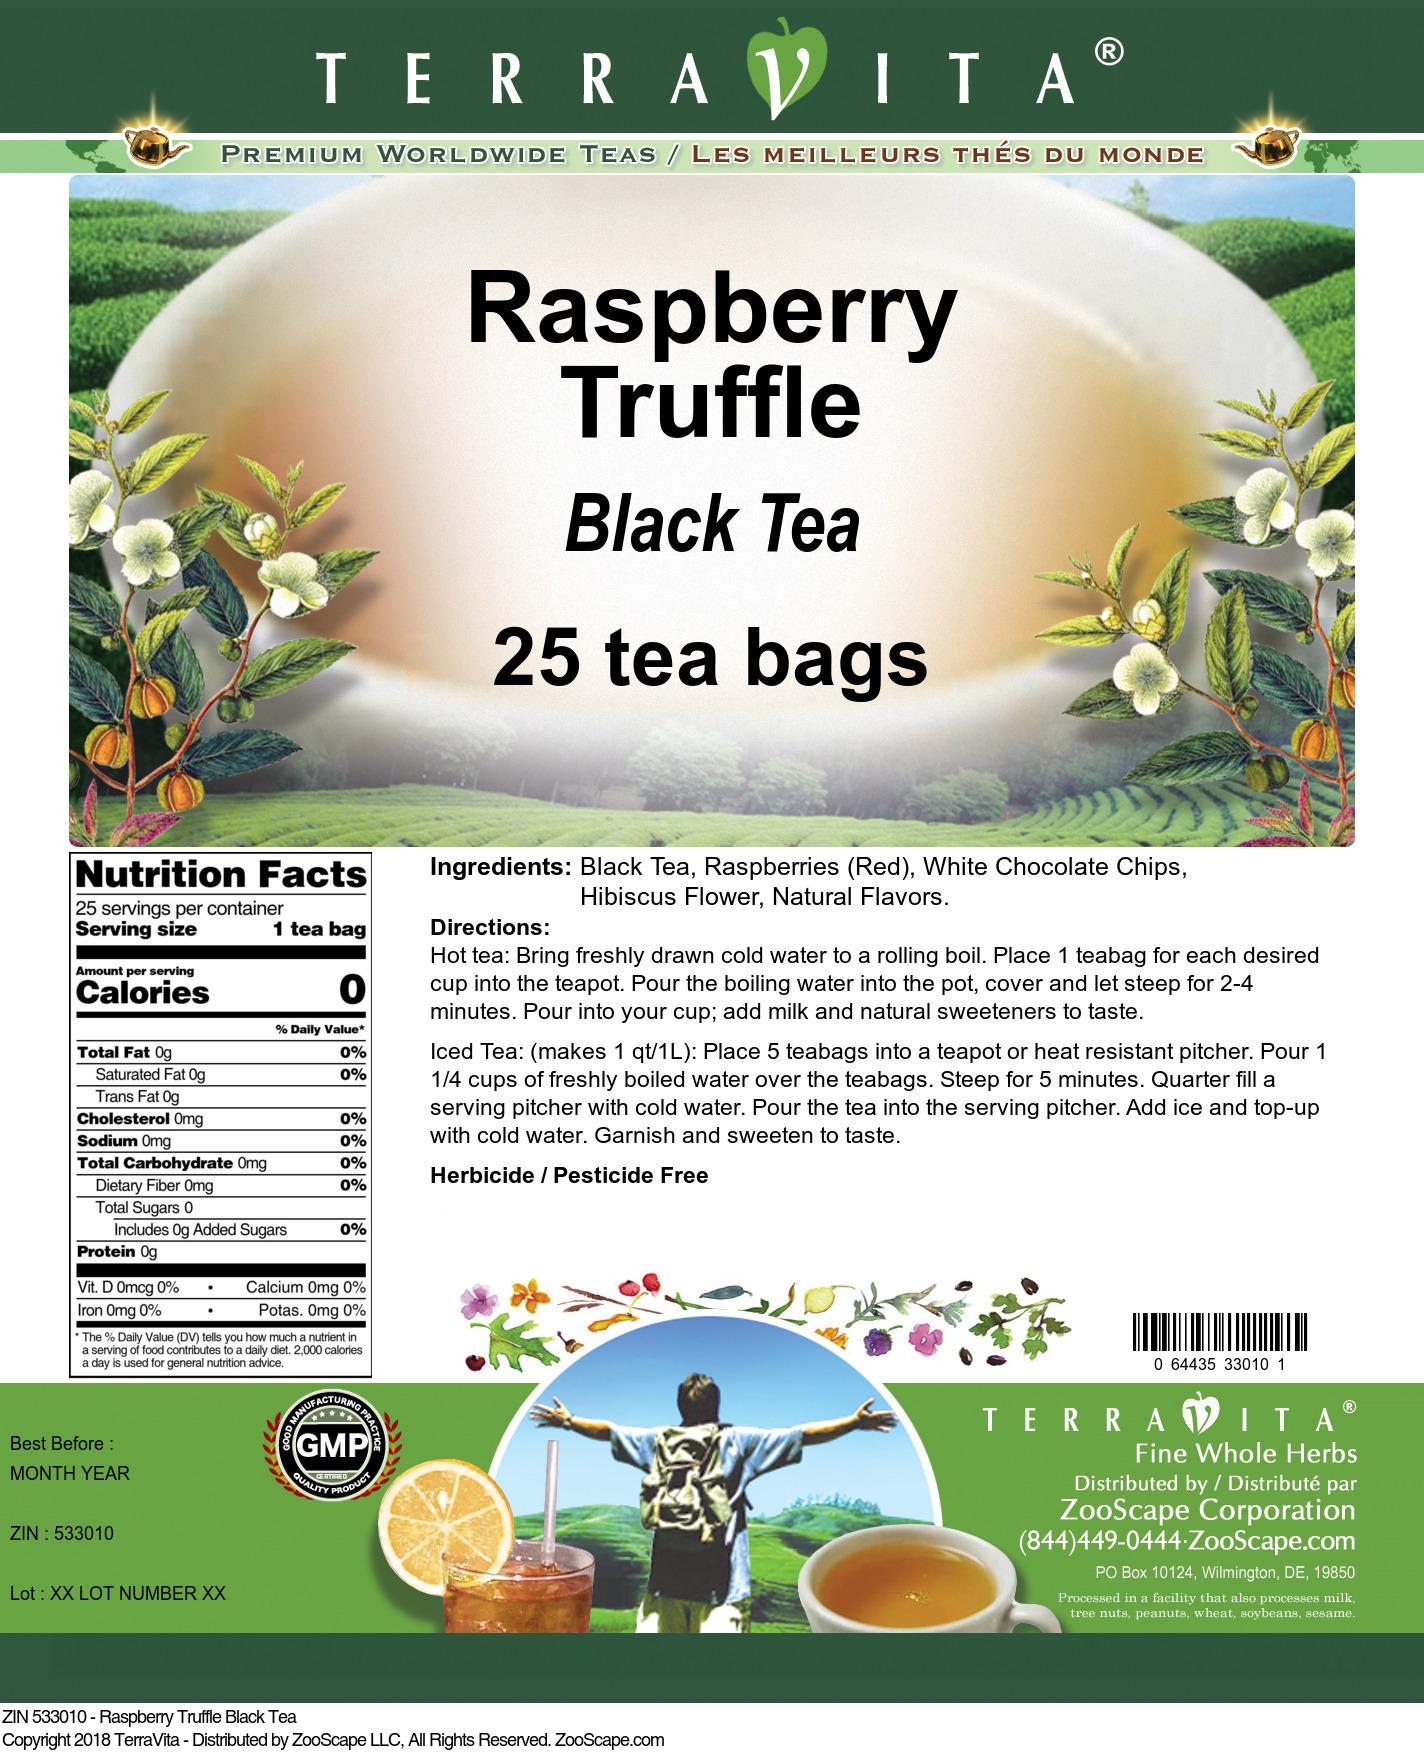 Raspberry Truffle Black Tea